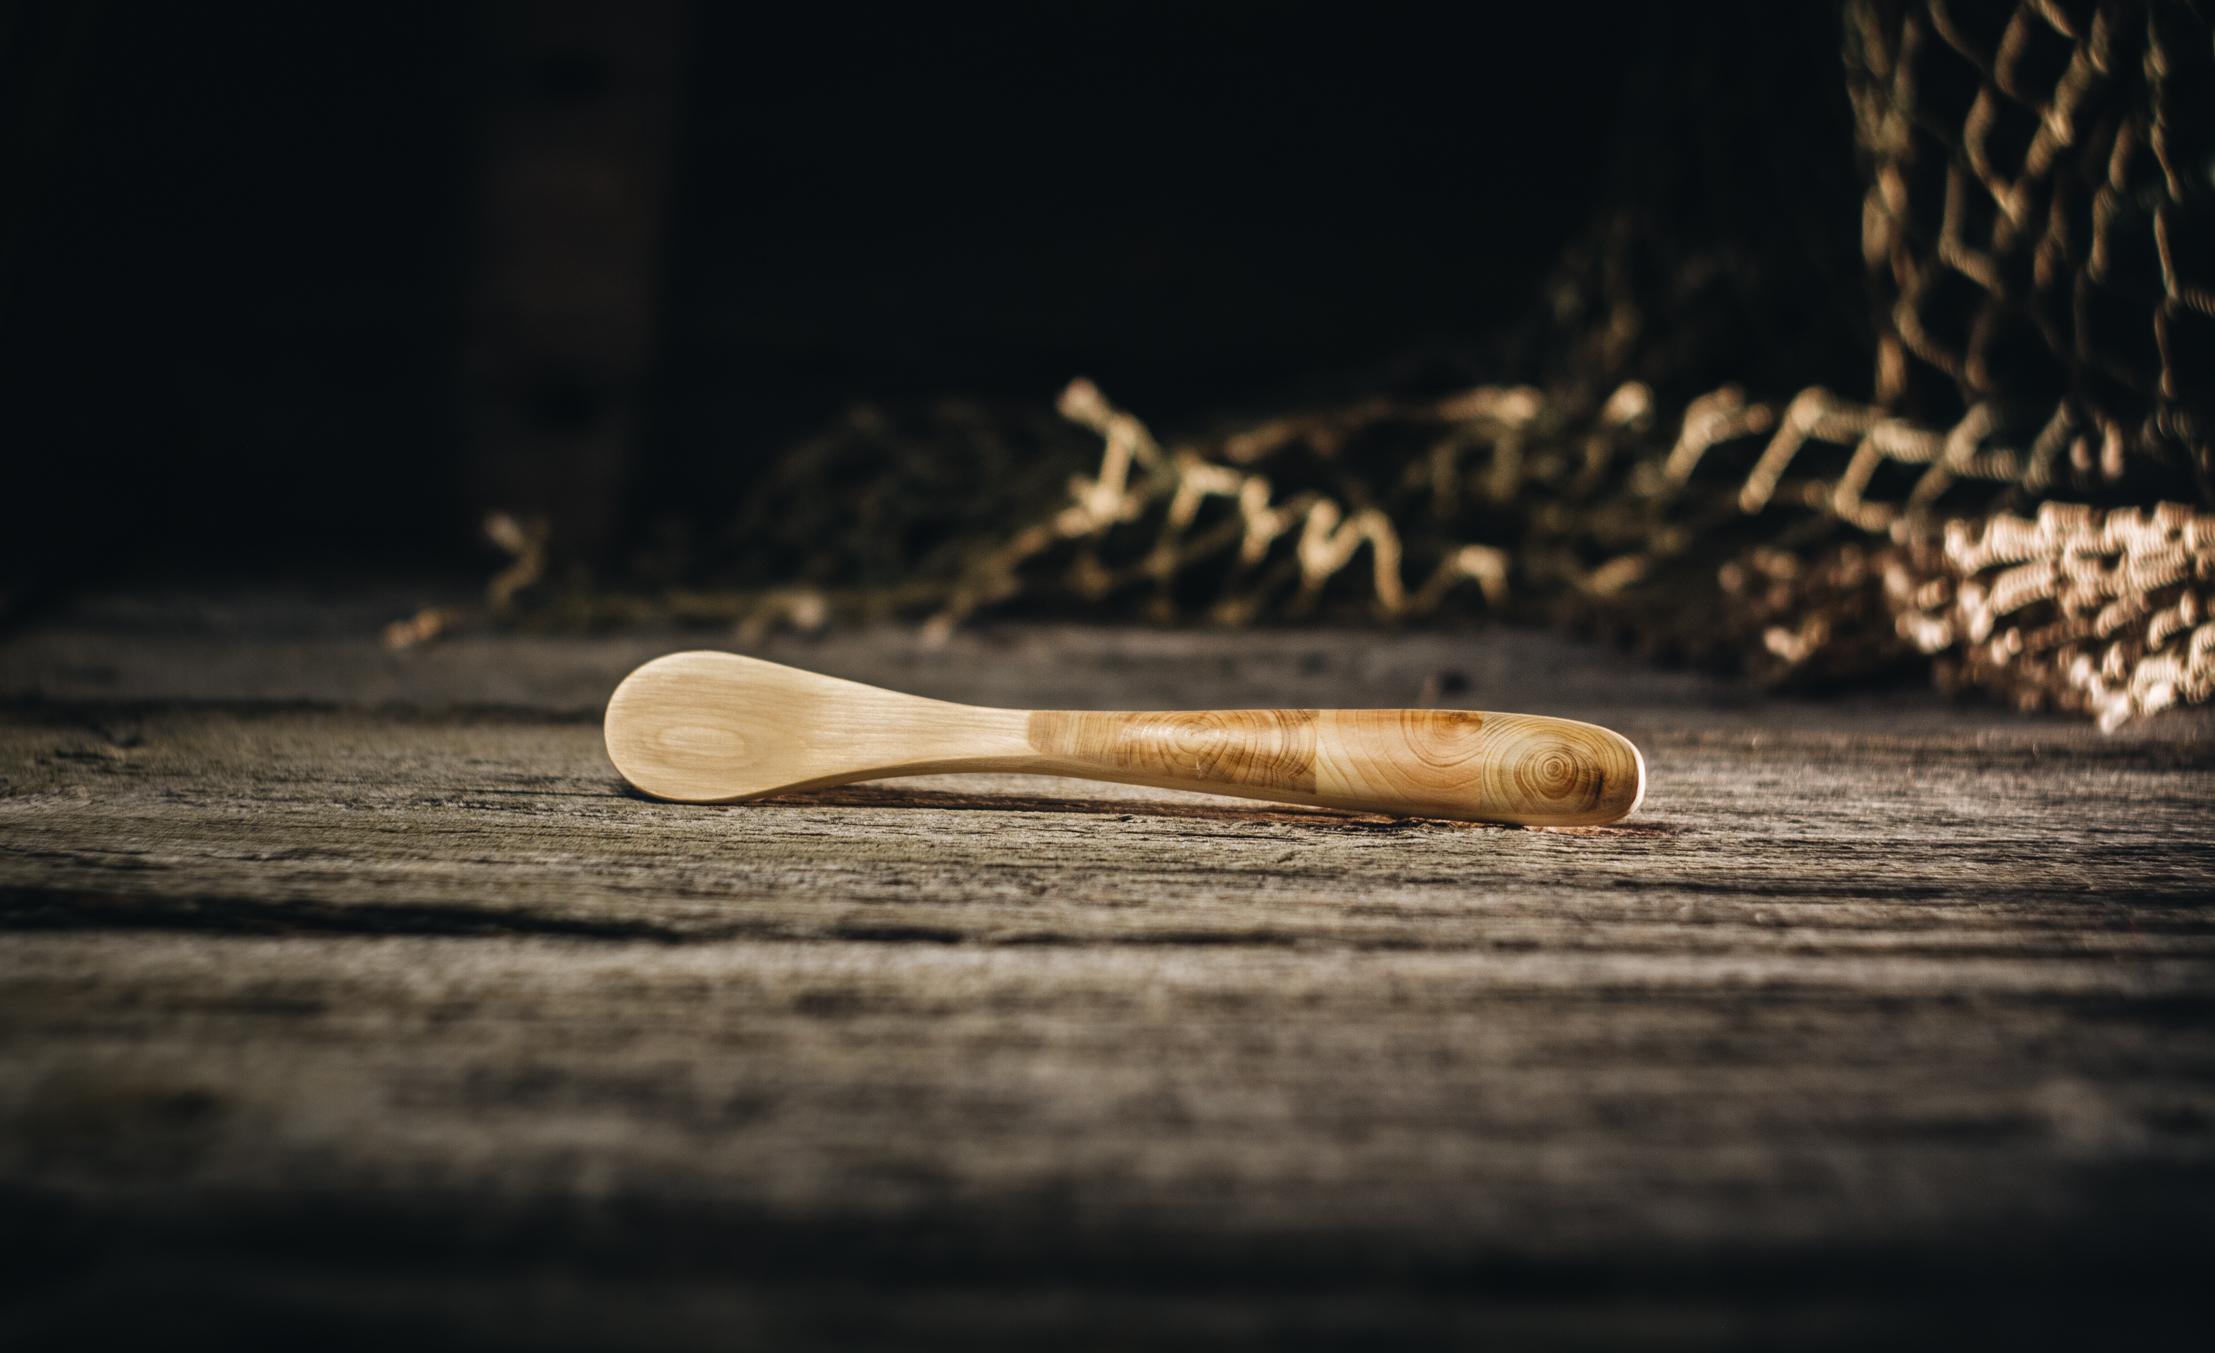 Sinepilusikas mosaiikpeaga (kadakas)/ Mustard spoon mosaic (juniper) 130 mm